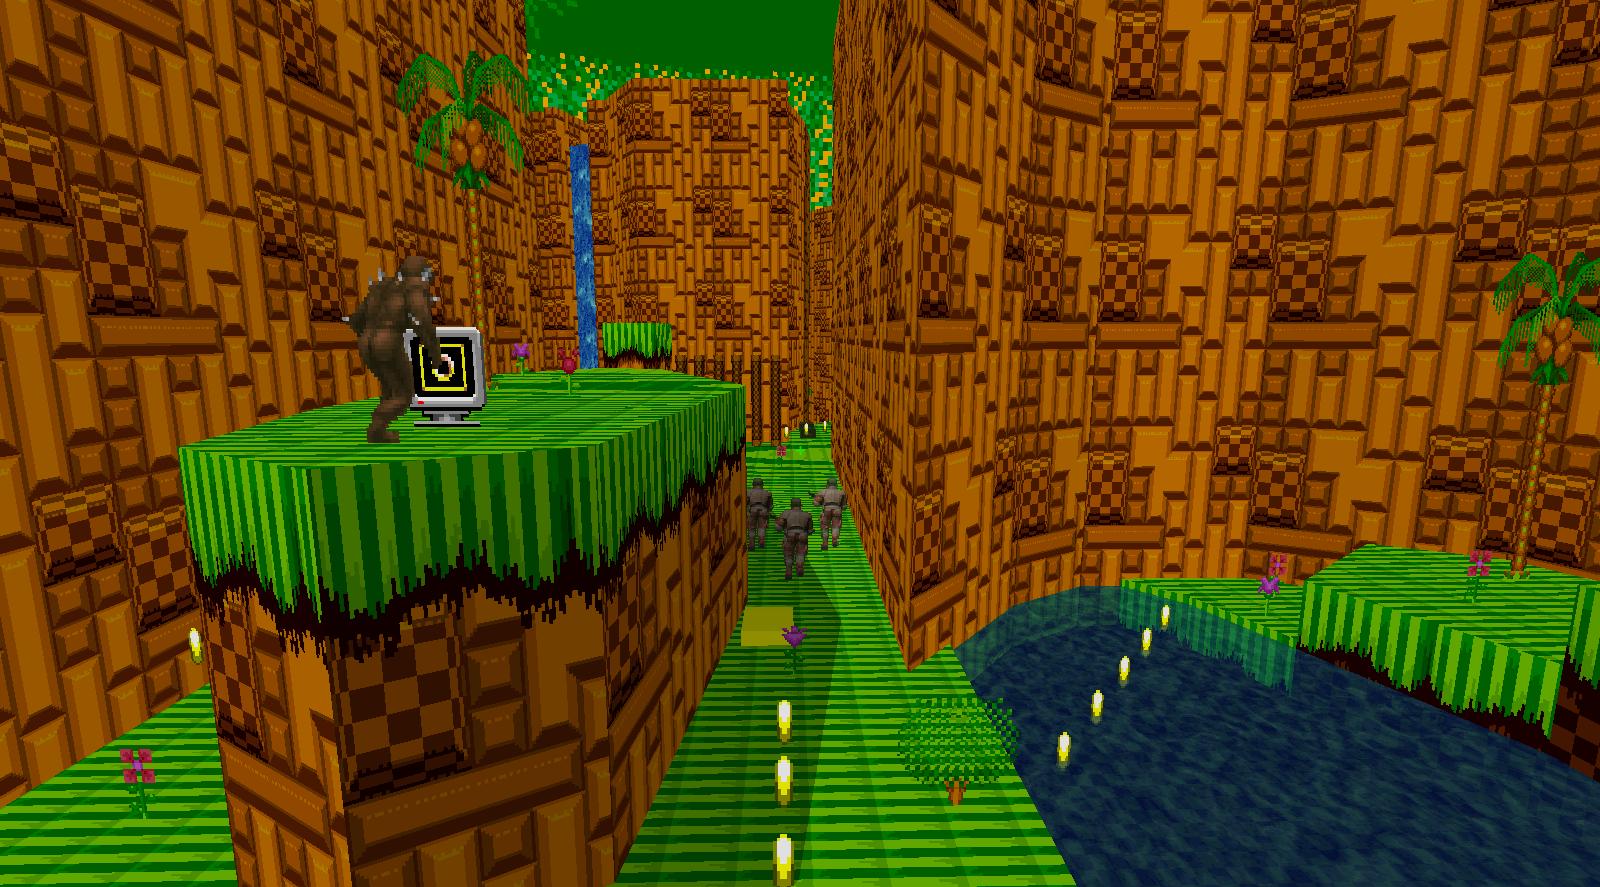 Emerald Hill Zone Image Sonic World Doom Mod For Doom Ii Mod Db